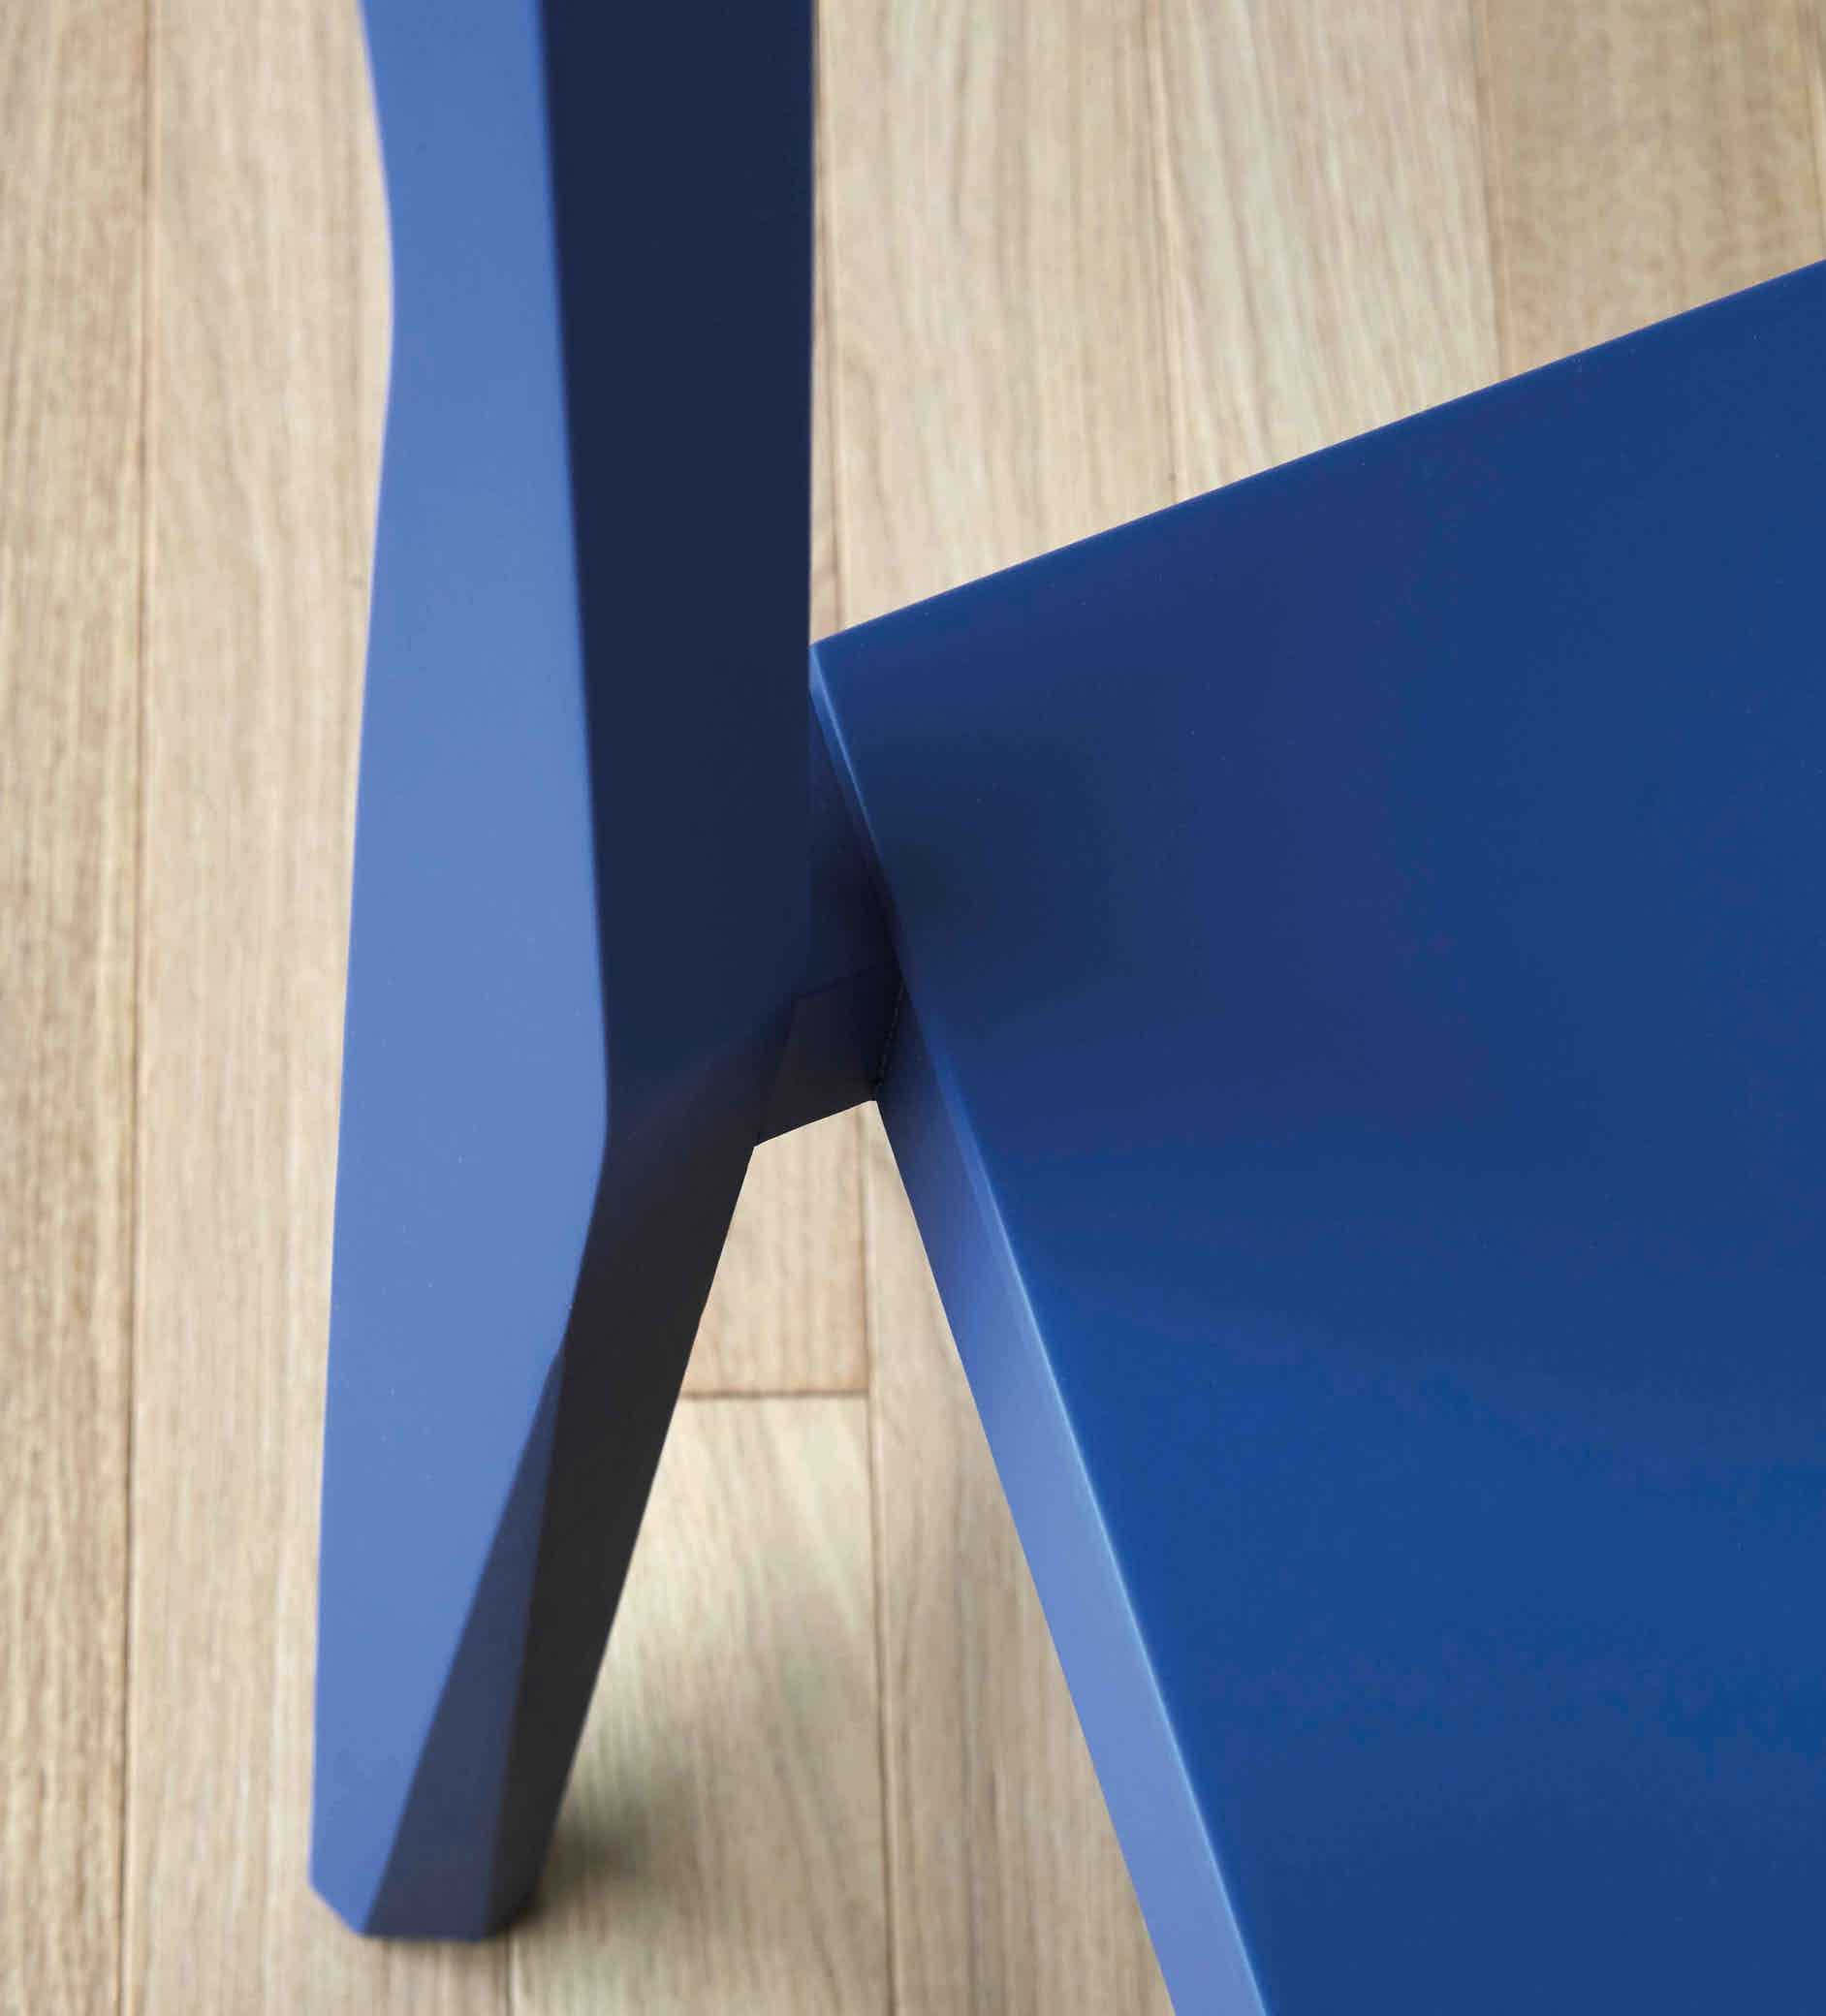 Miniforms Emilia Chair Seat Detail Haute Living